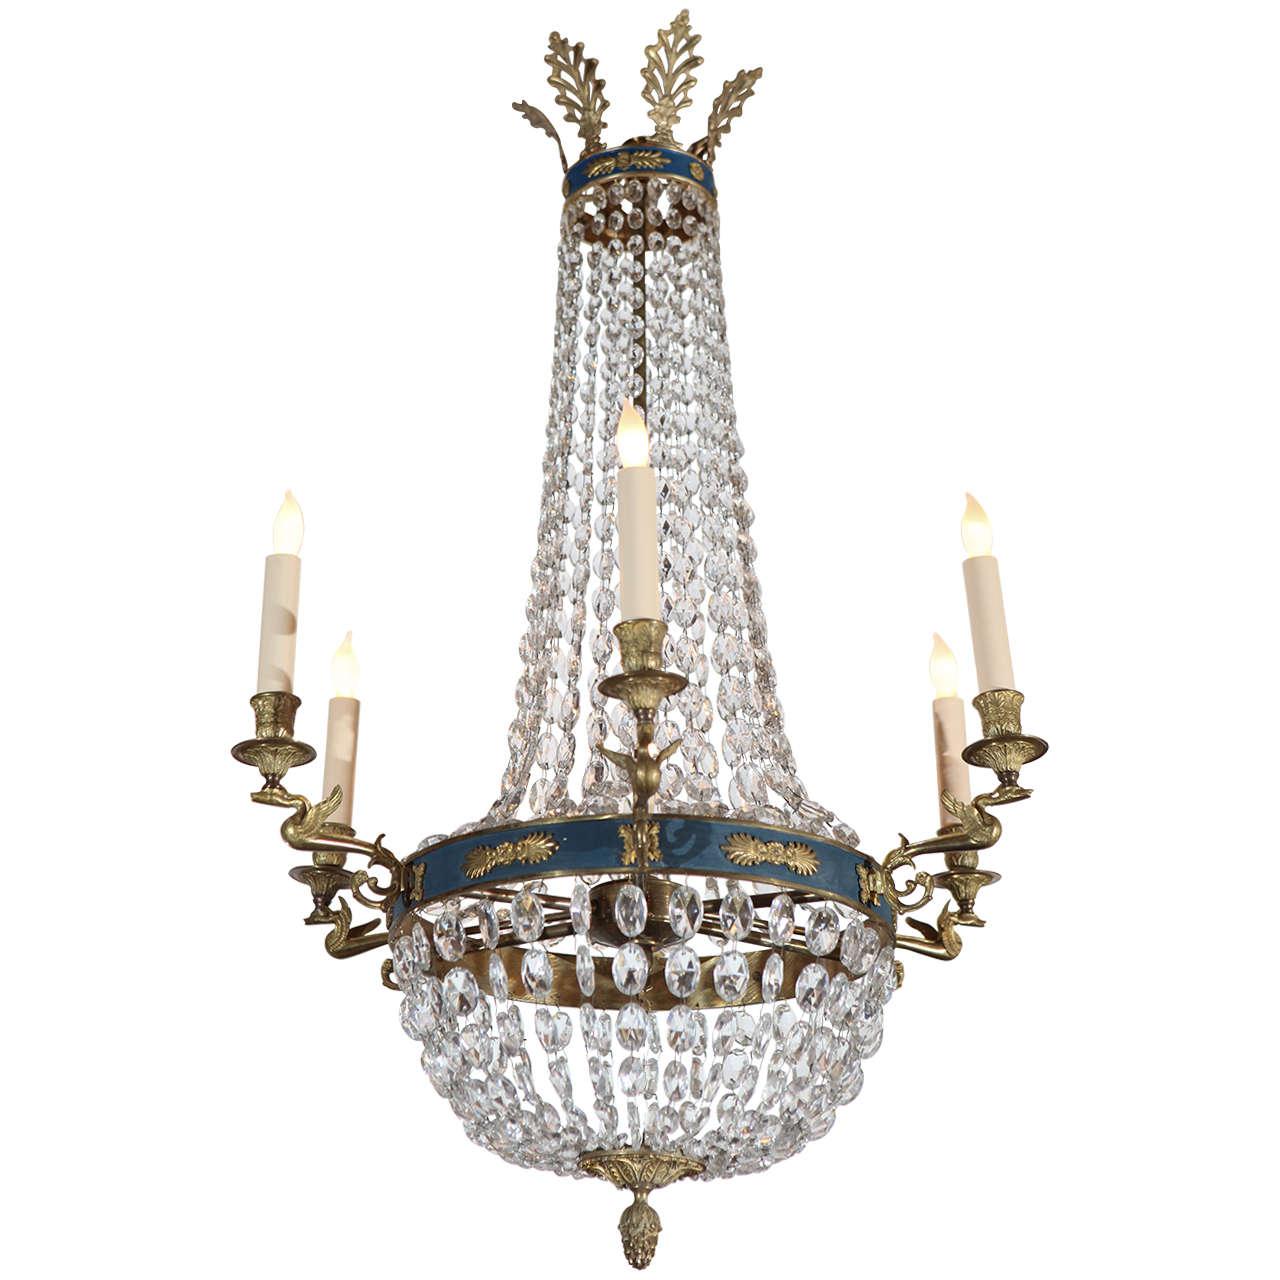 Euro Chandelier Lighting: Neoclassical Crystal European Chandelier At 1stdibs